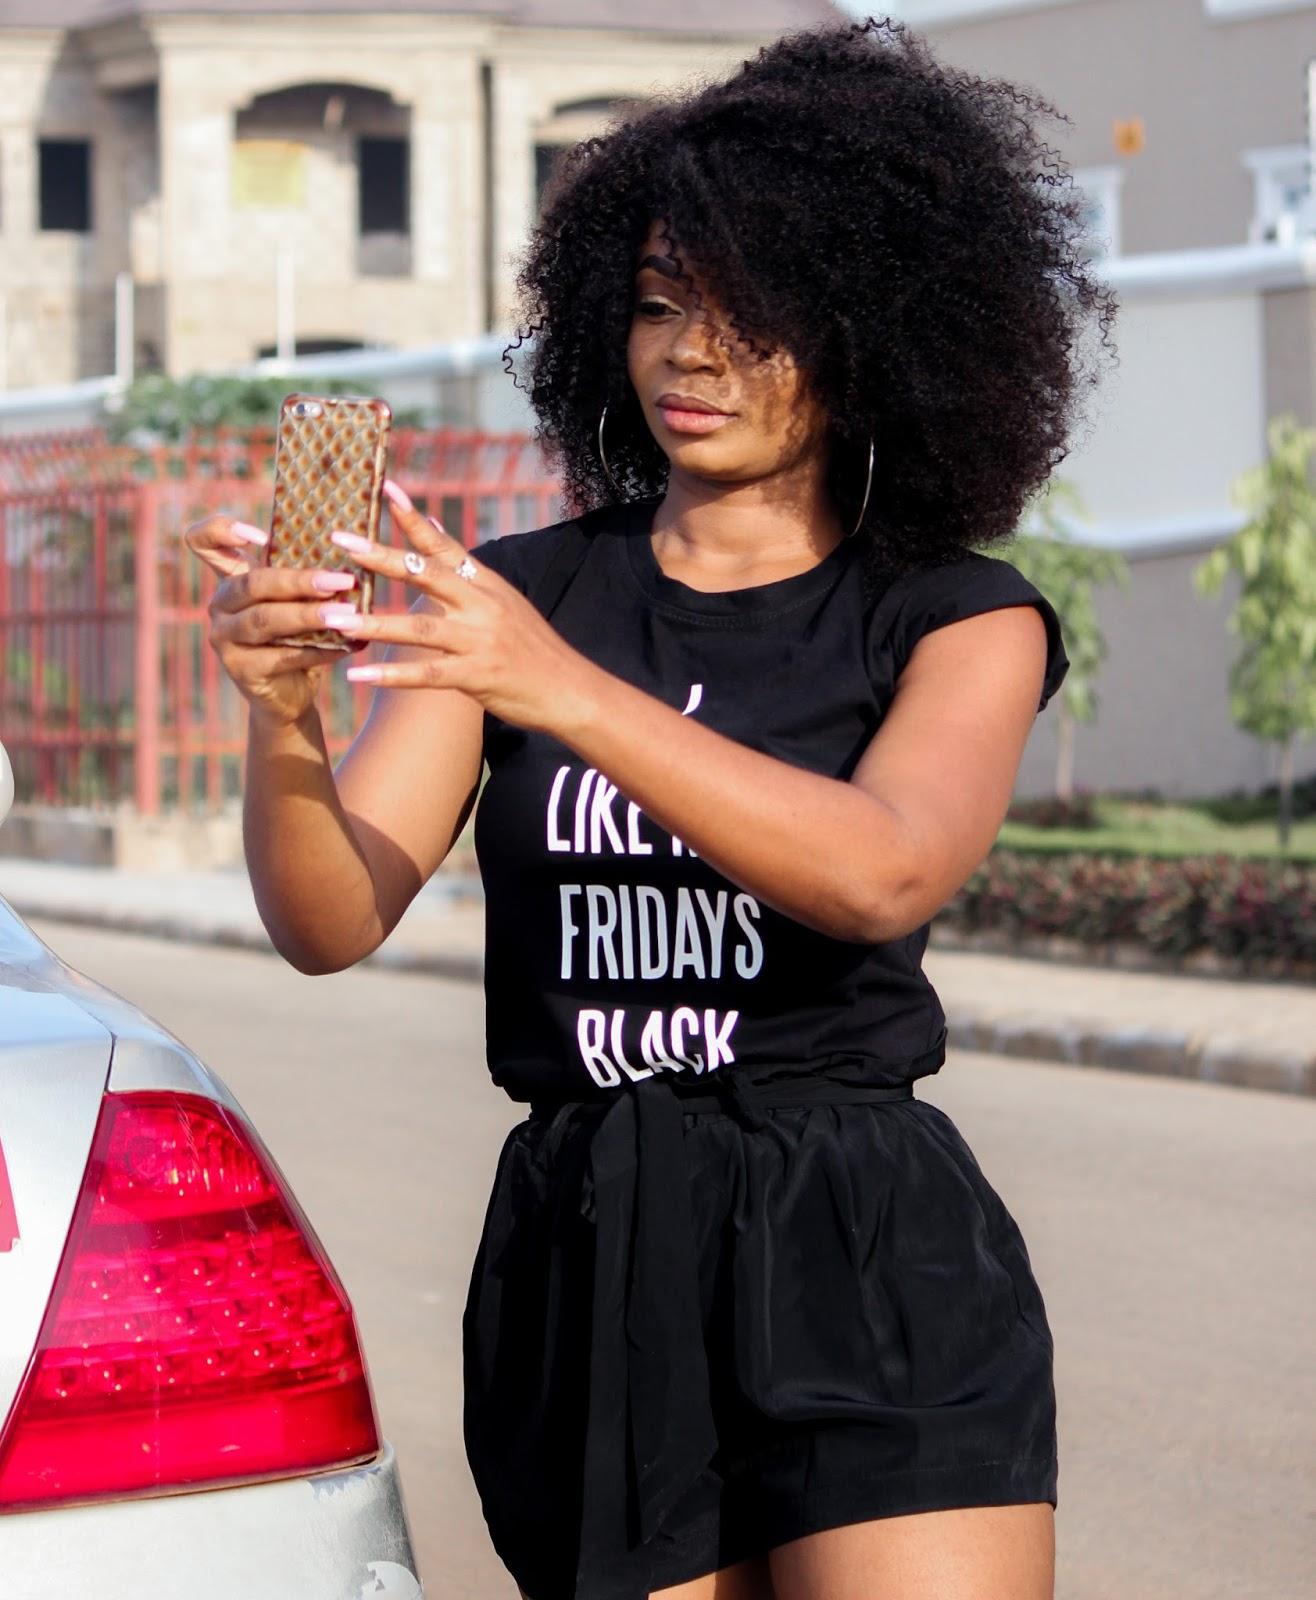 I LIKE MY FRIDAYS BLACK - JustPorshxJumia Black Friday Collaboration & Giveaway